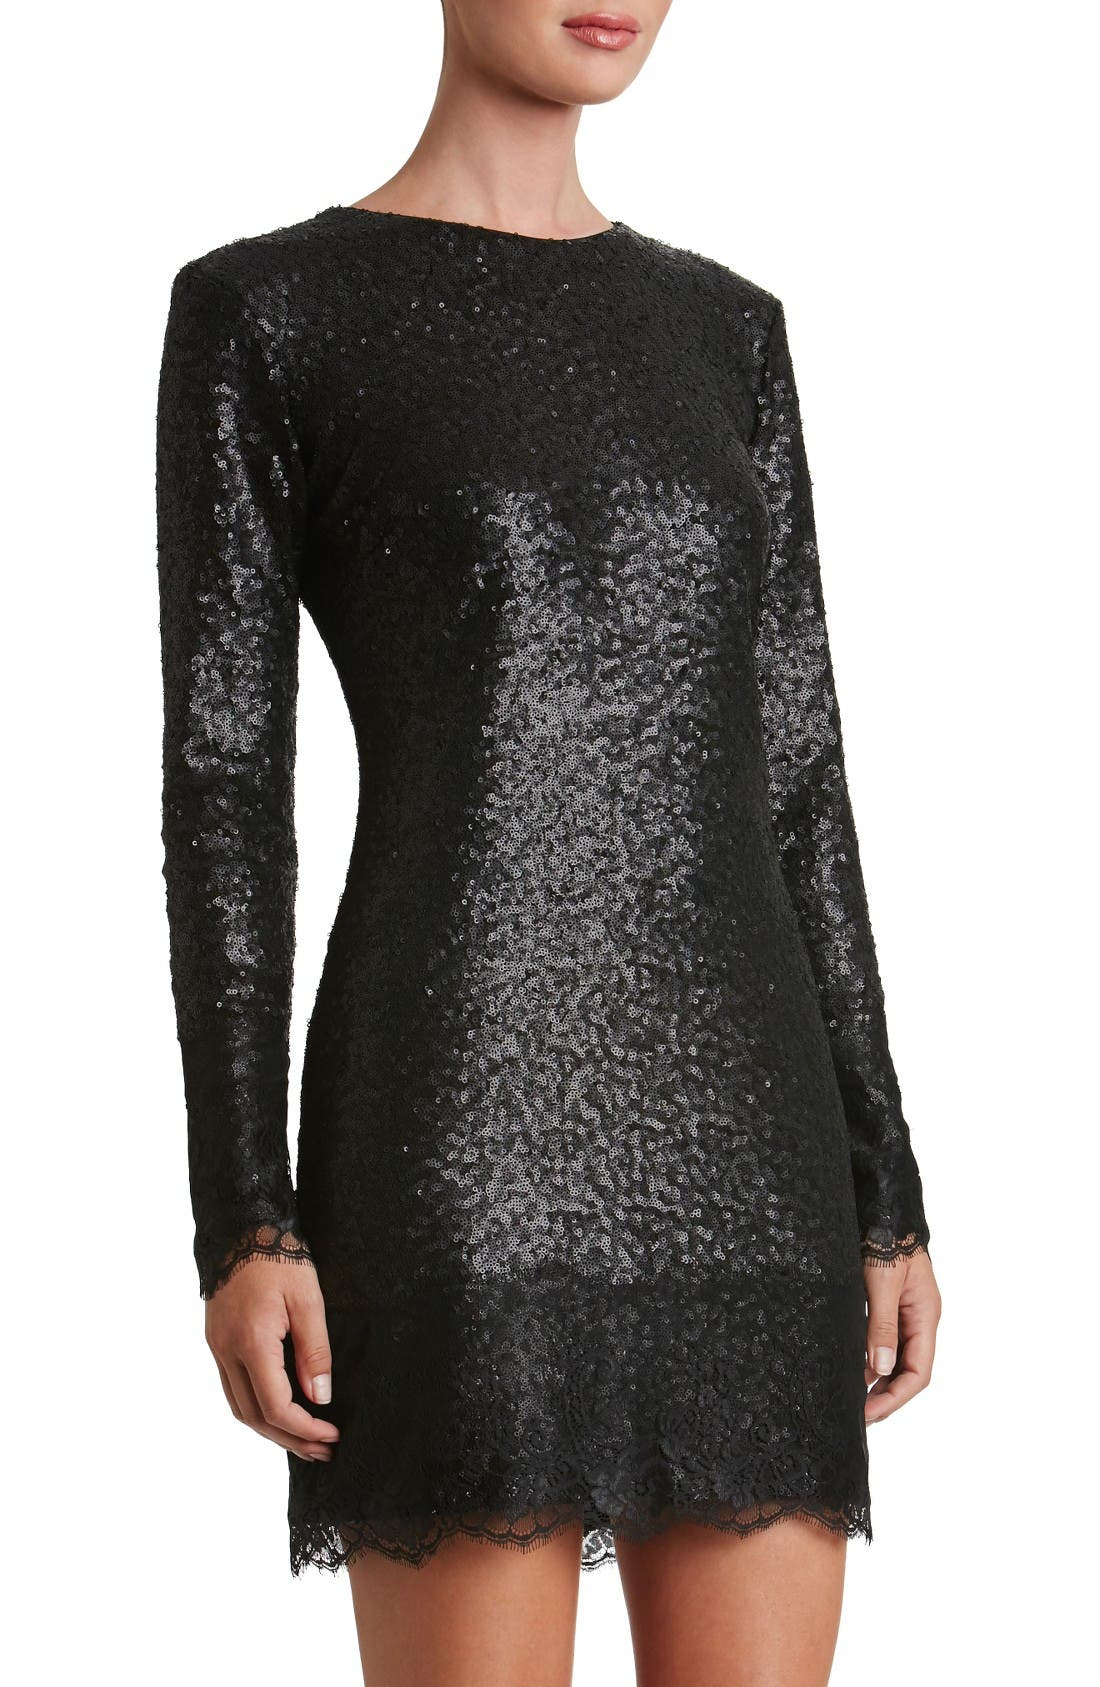 Main Image - Dress the Population Kate Lace Trim Sequin Dress